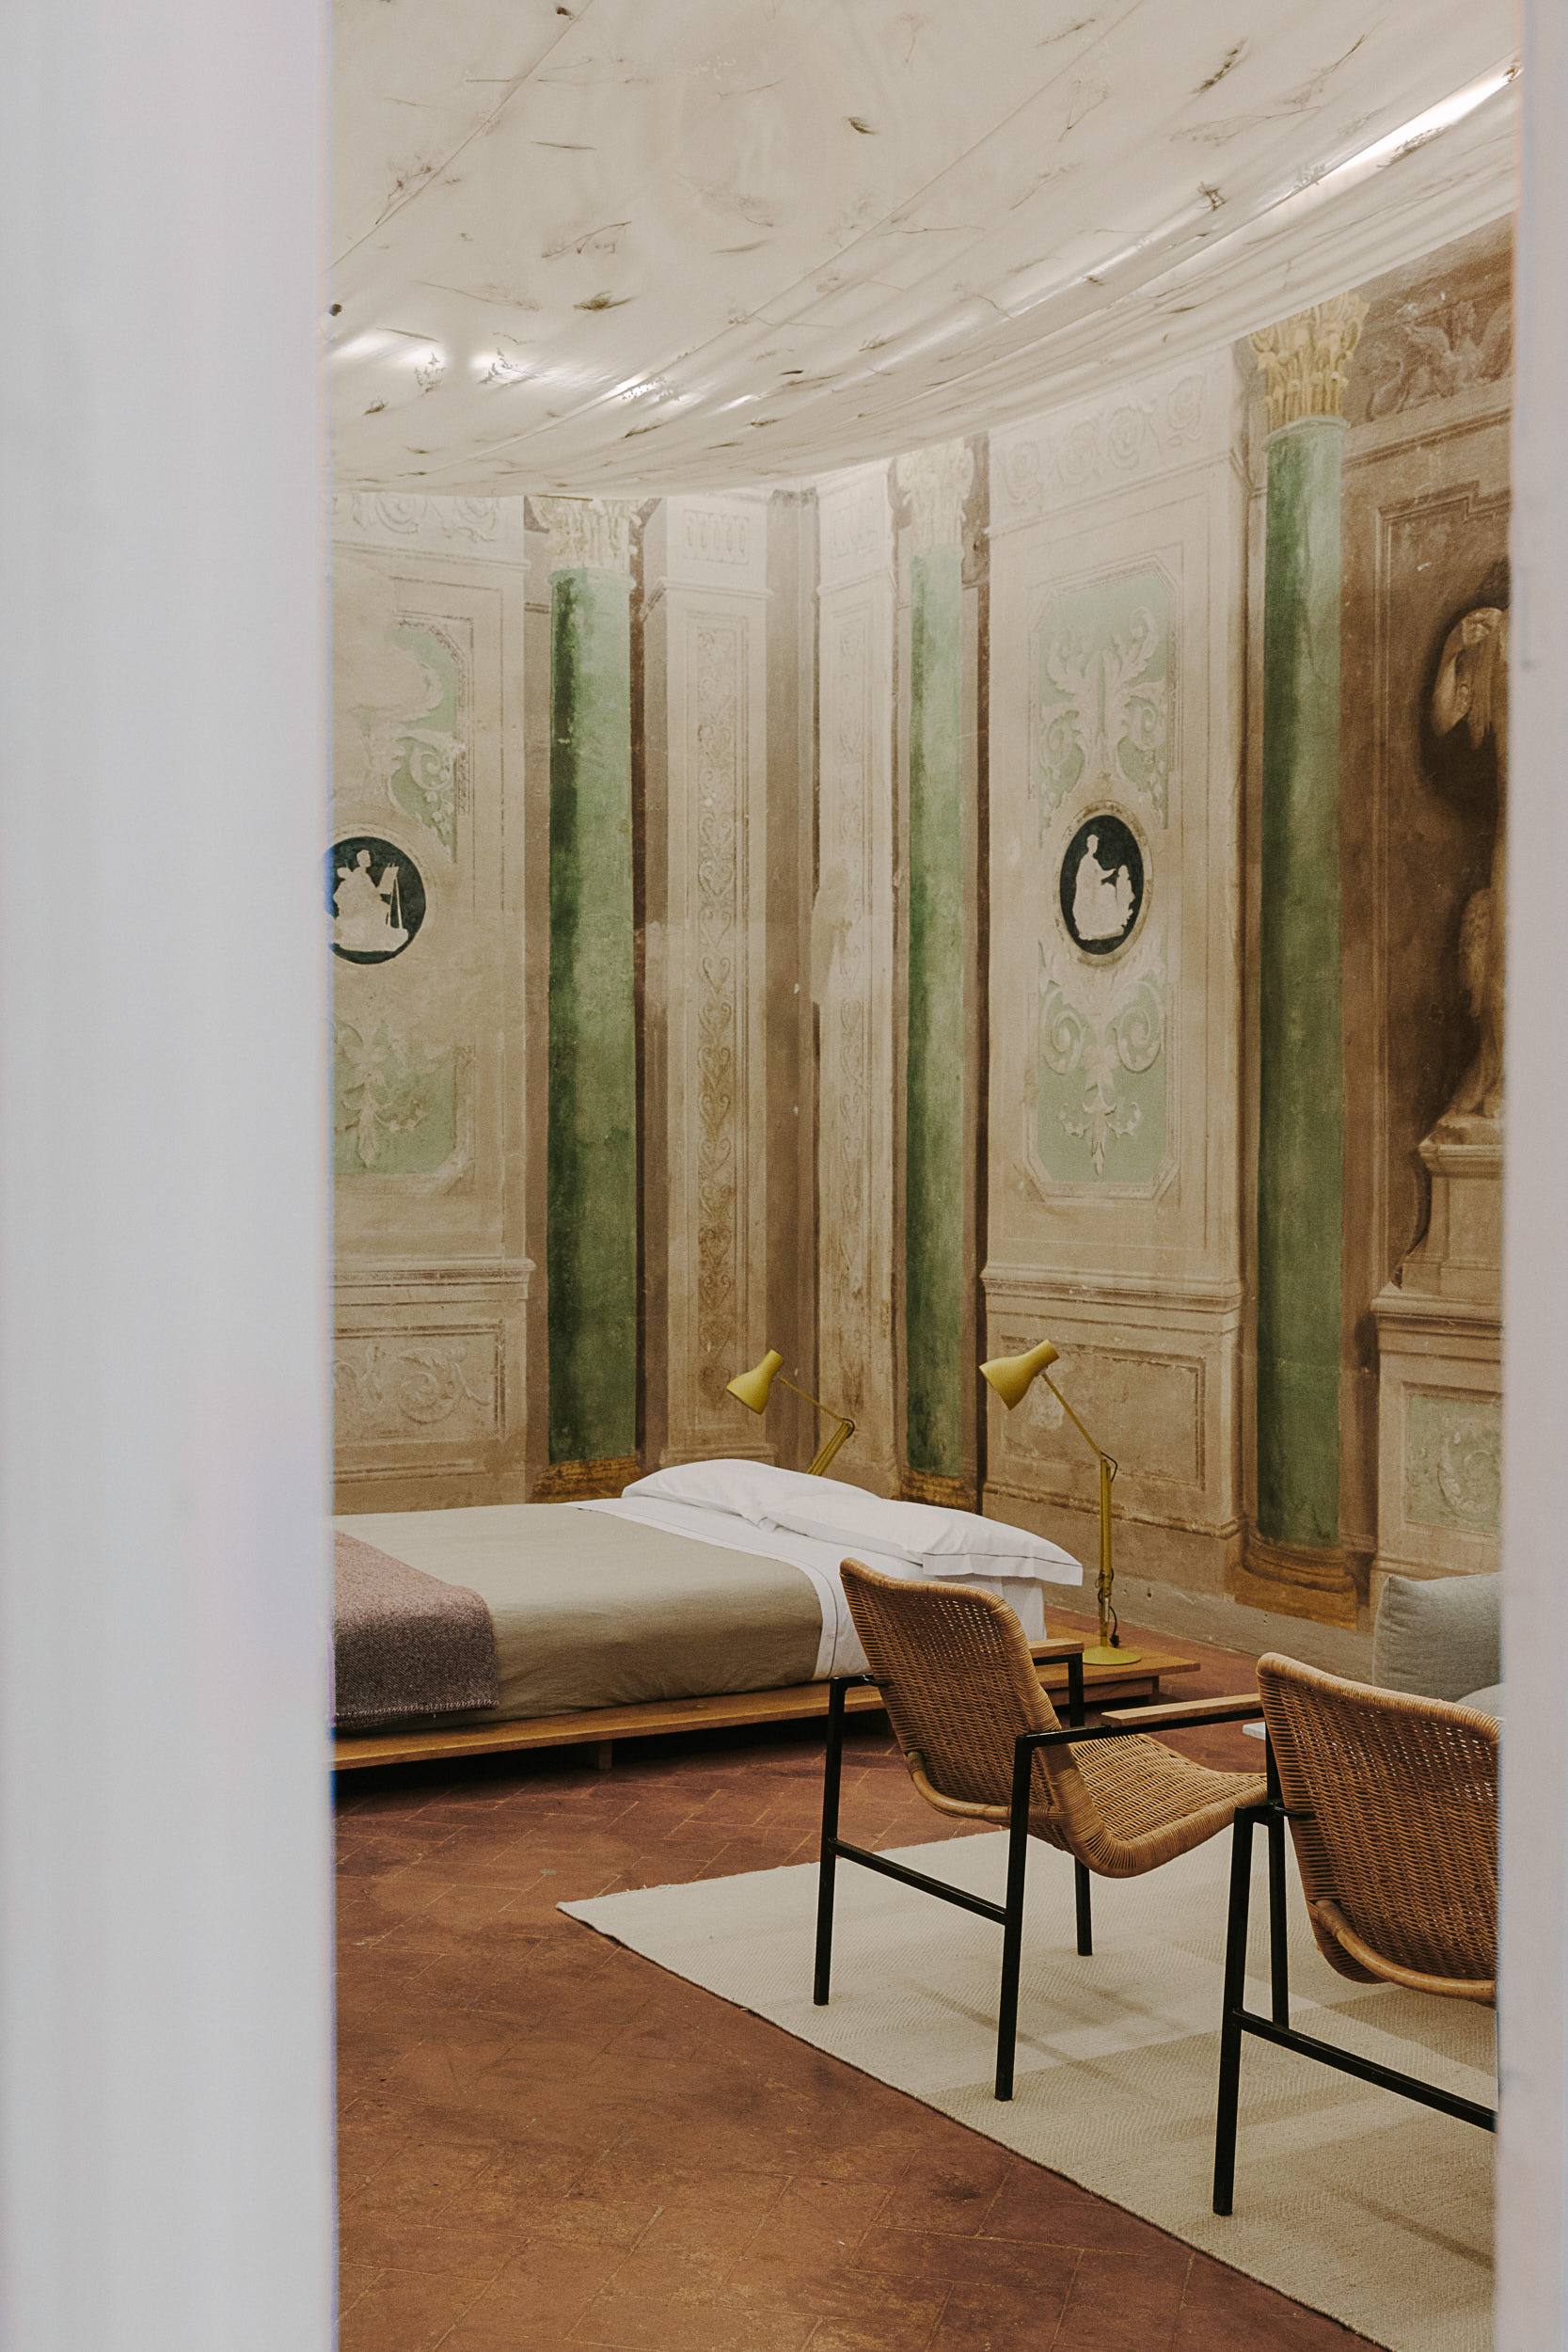 FRAGMENTS : Ksenia Tokmakova and Marinika Sadgyan Explore Italian Memories at Numeroventi, Florence on Anniversary Magazine